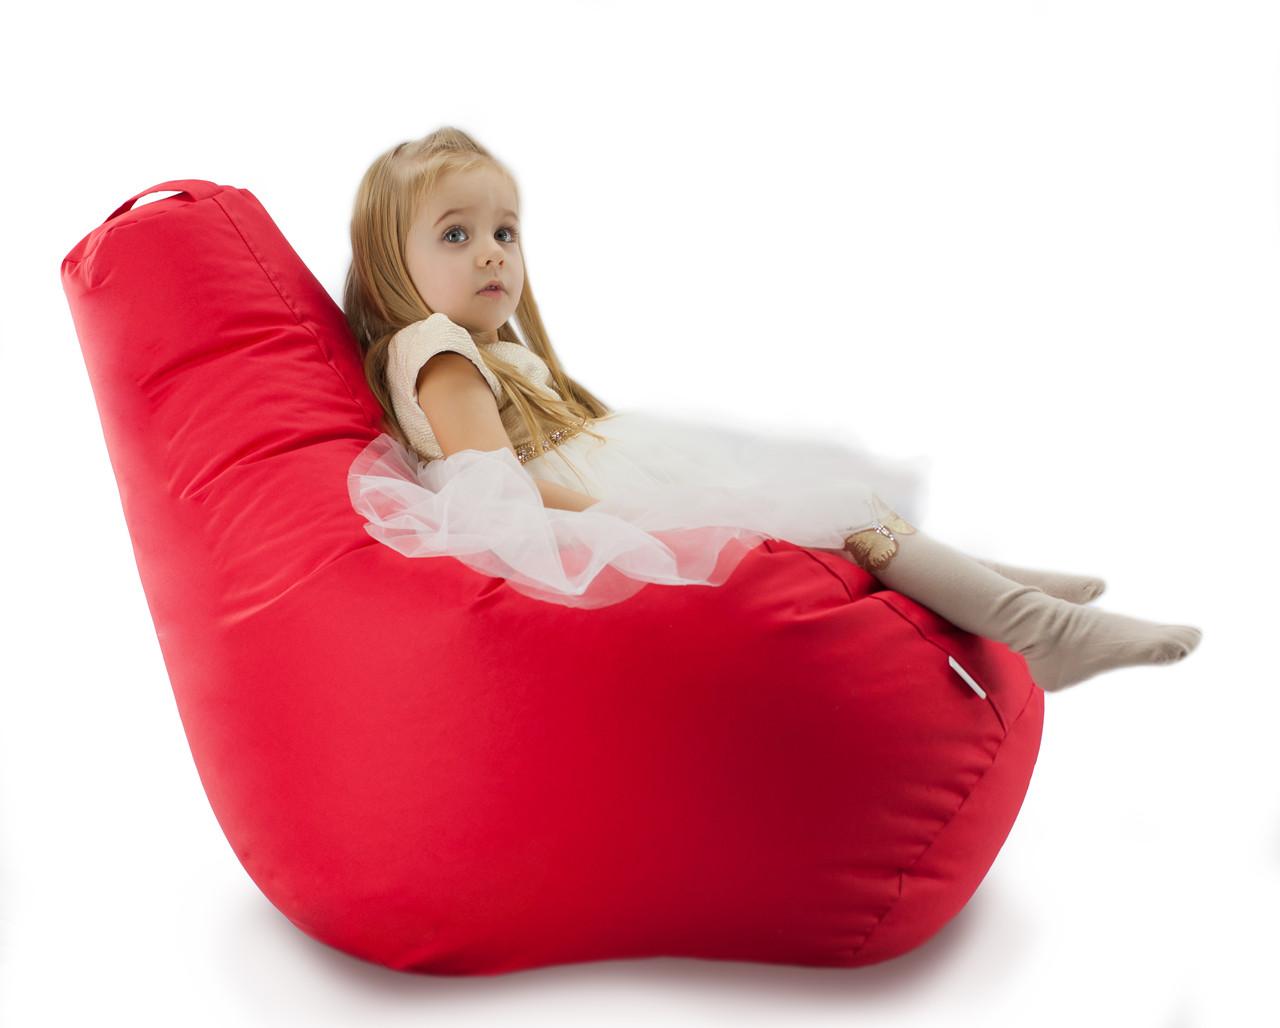 Дитяче крісло-груша з тканини Оксфорд 420